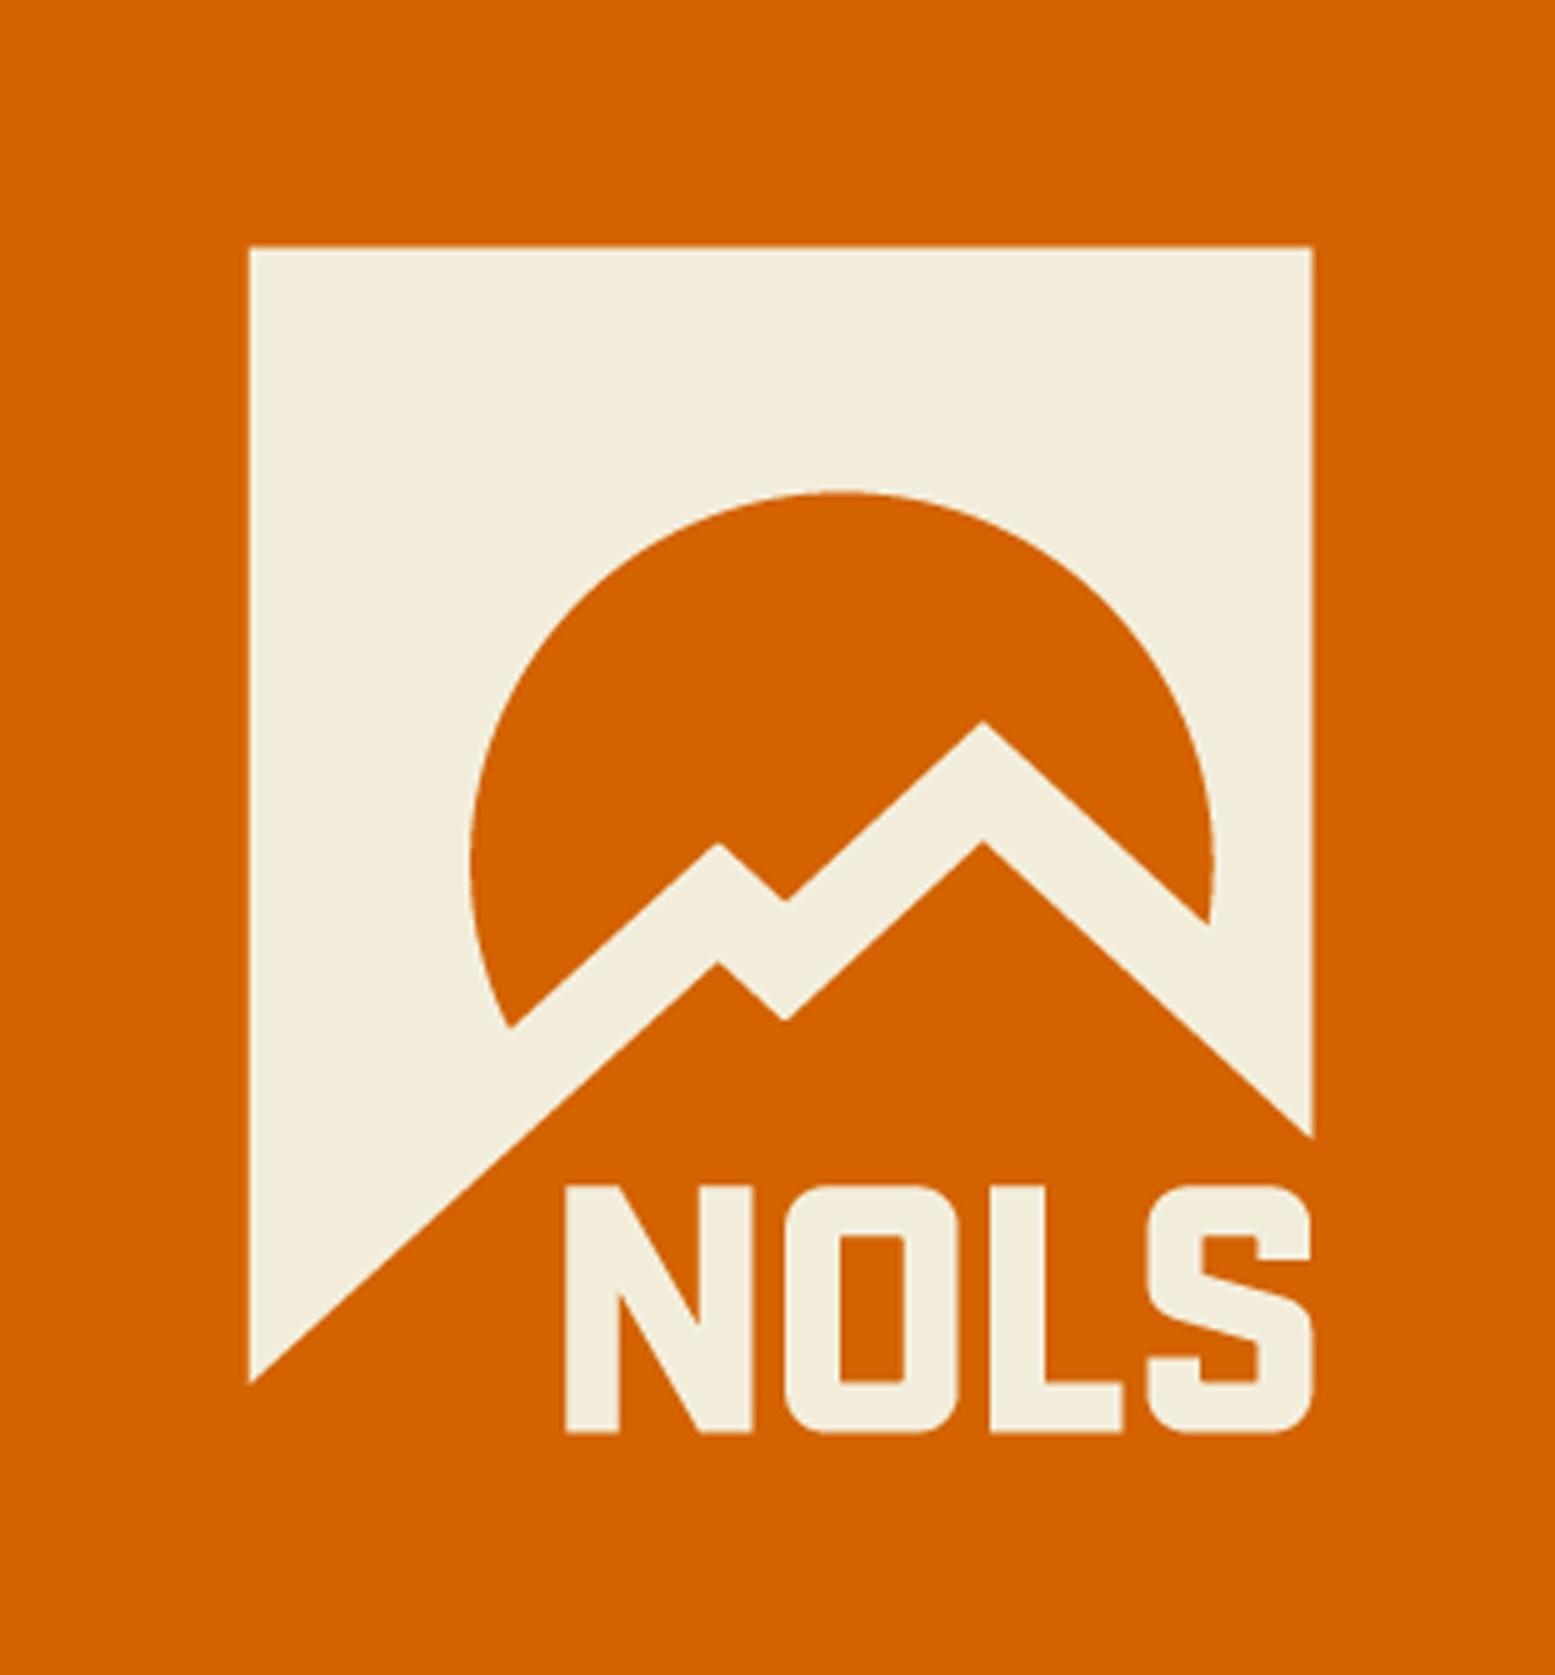 nols-logomark-medium